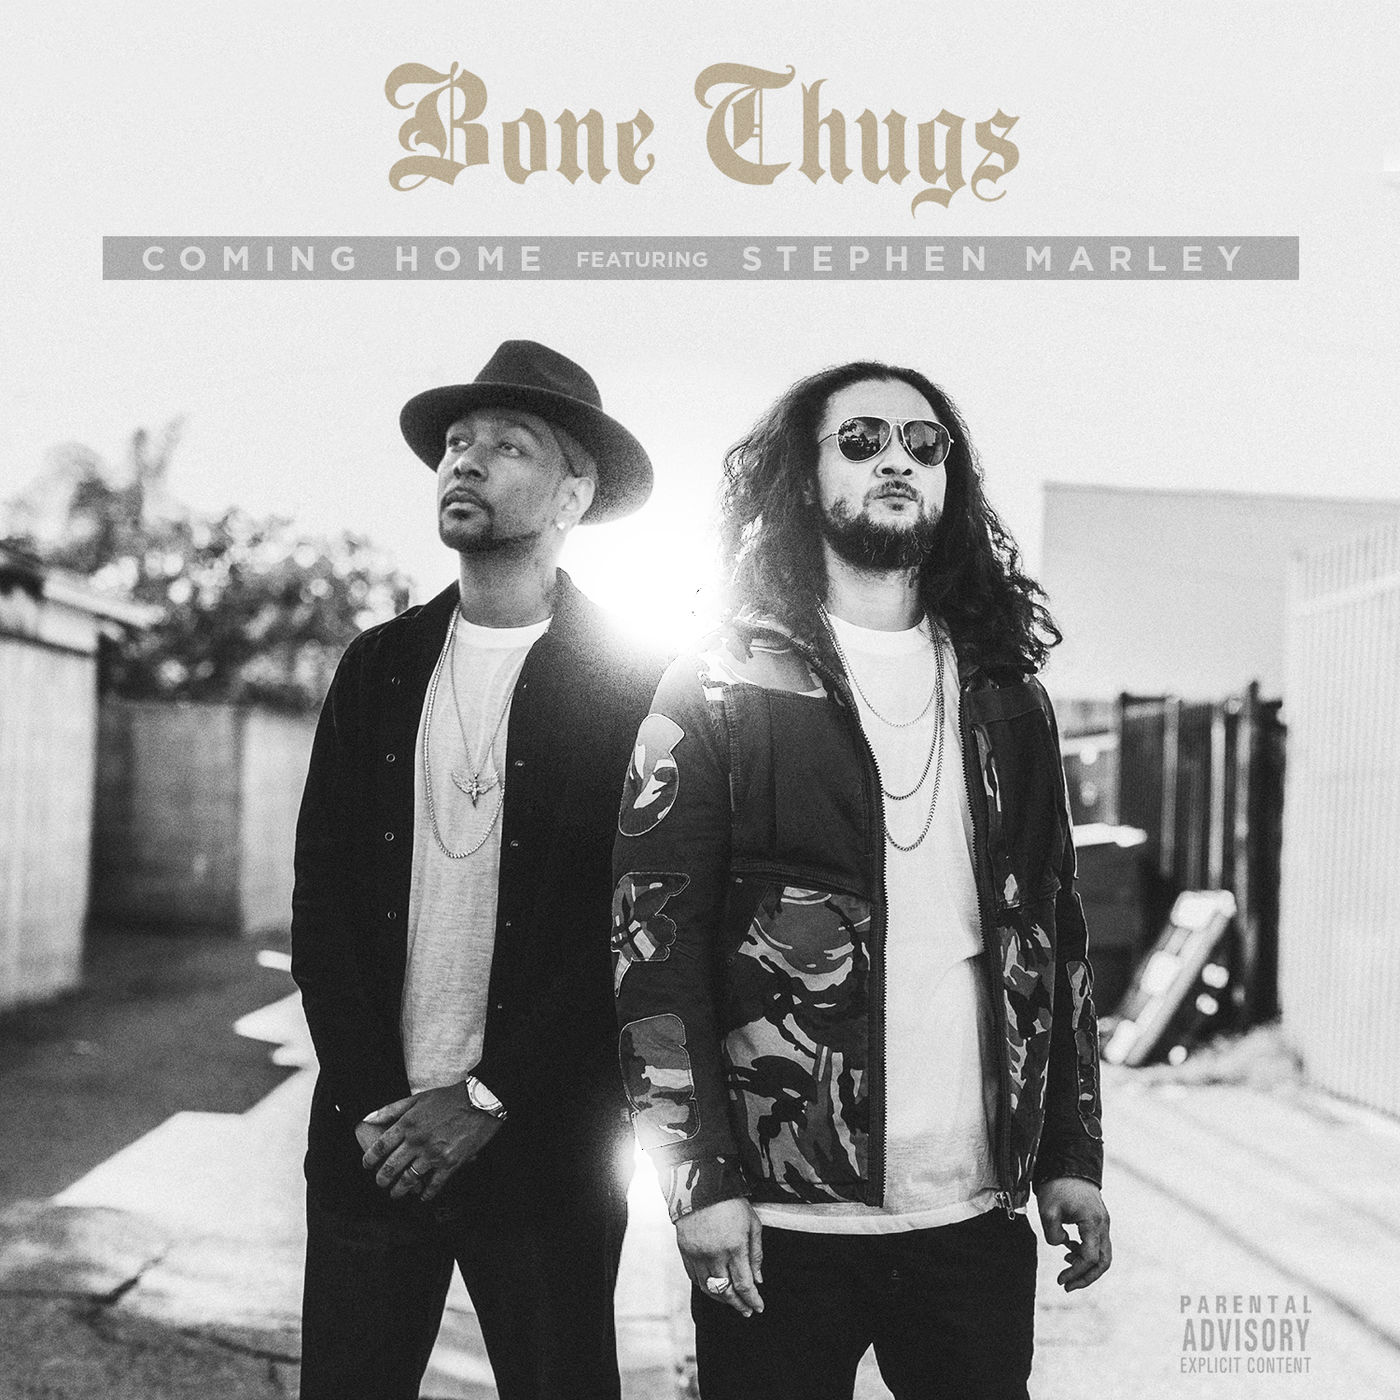 Bone Thugs Tour